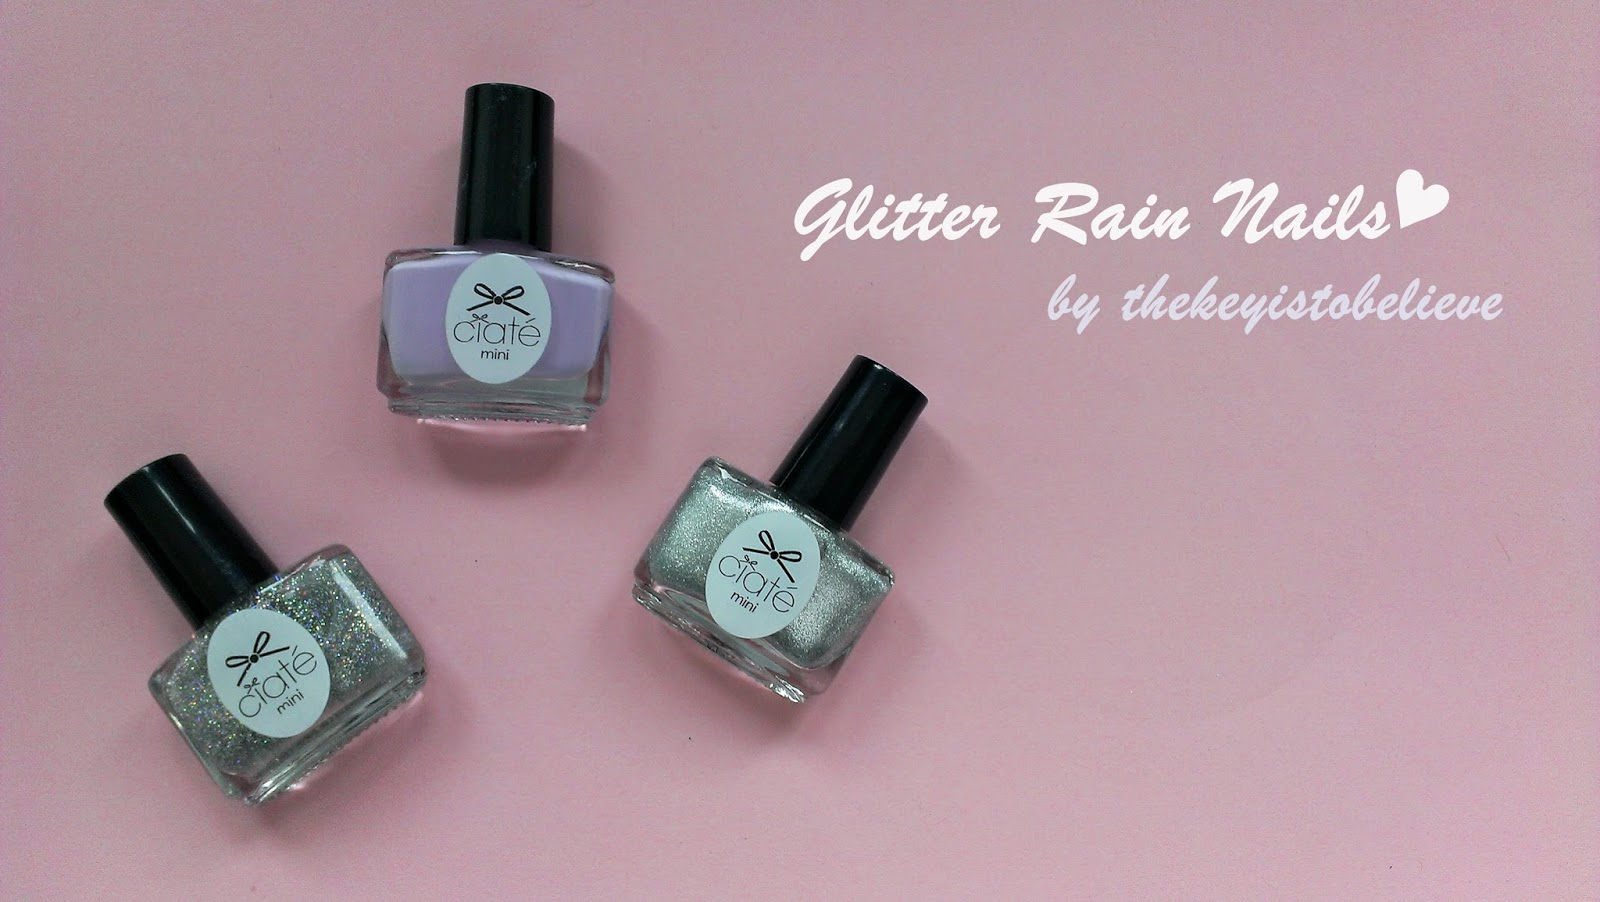 thekeyistobelieve: nails: glitter rain nails